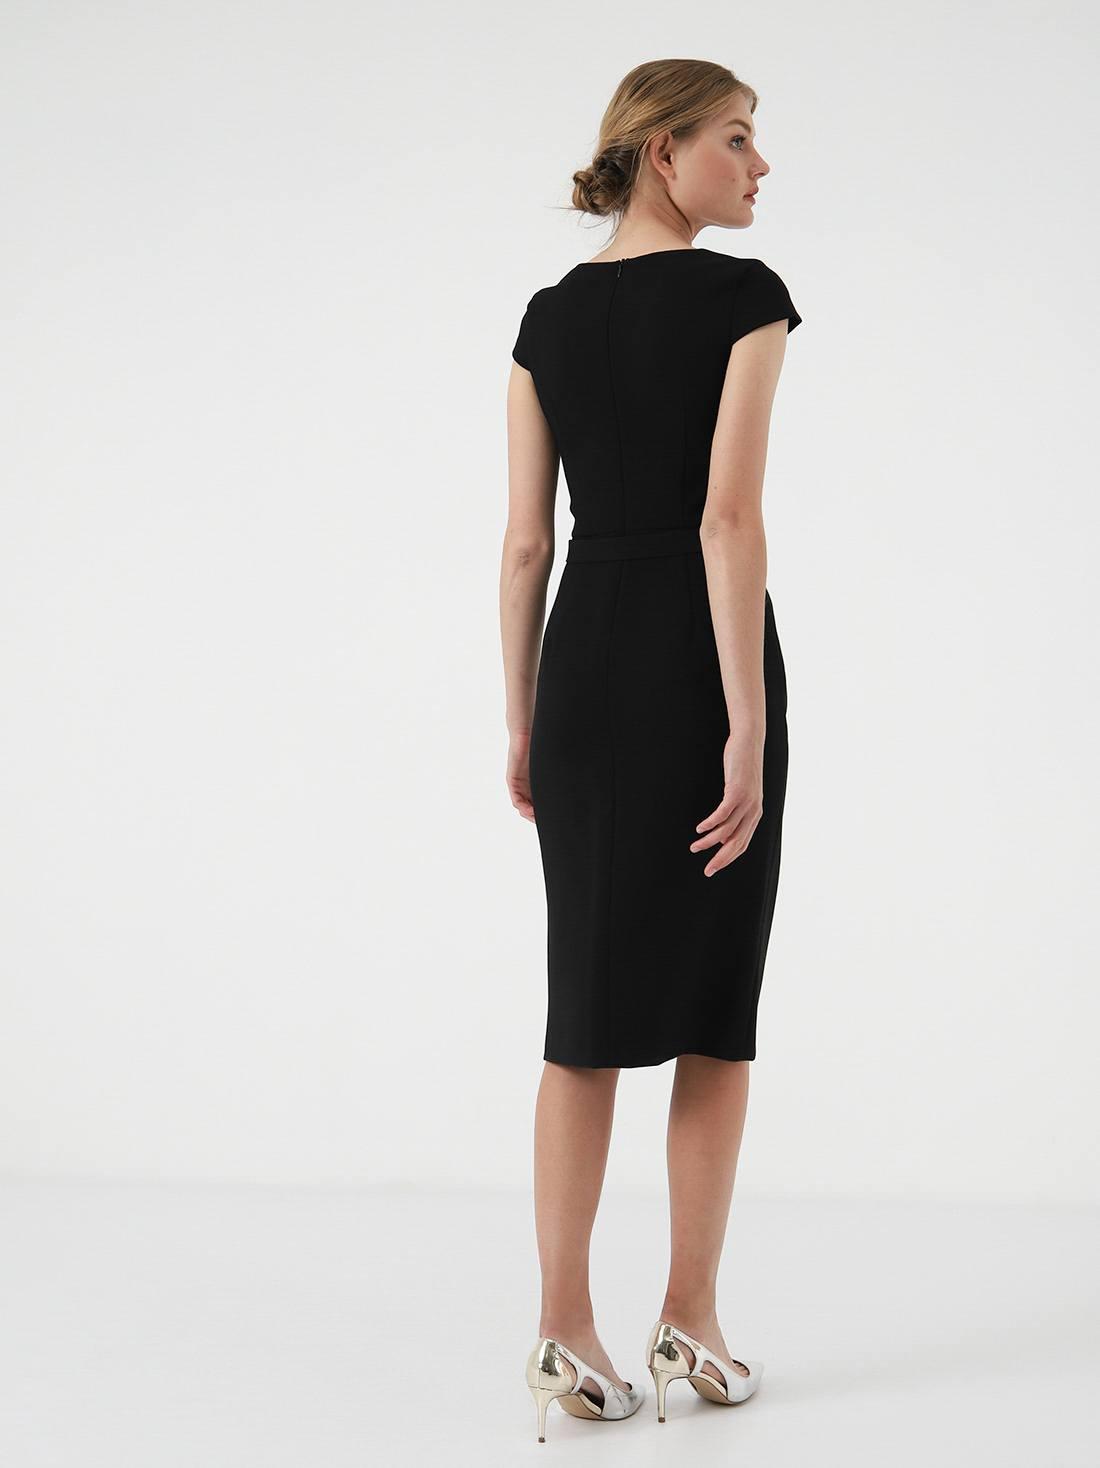 Платье - футляр с разрезом